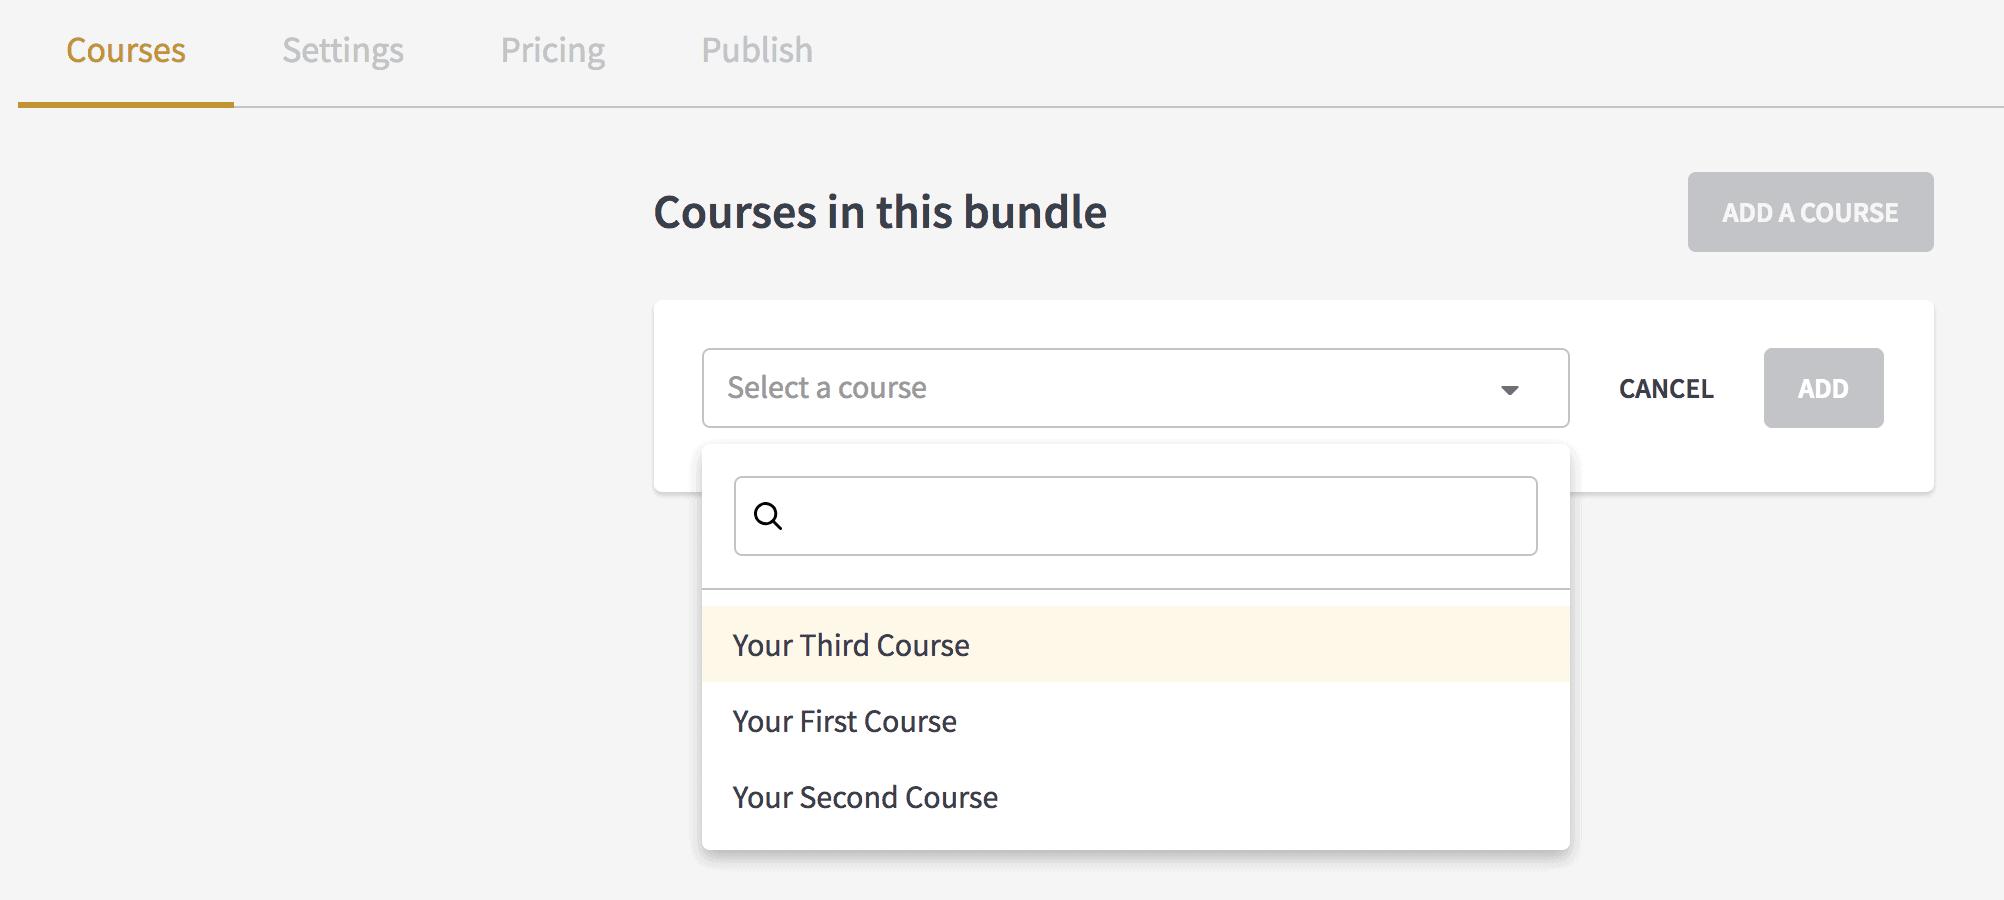 Course bundling